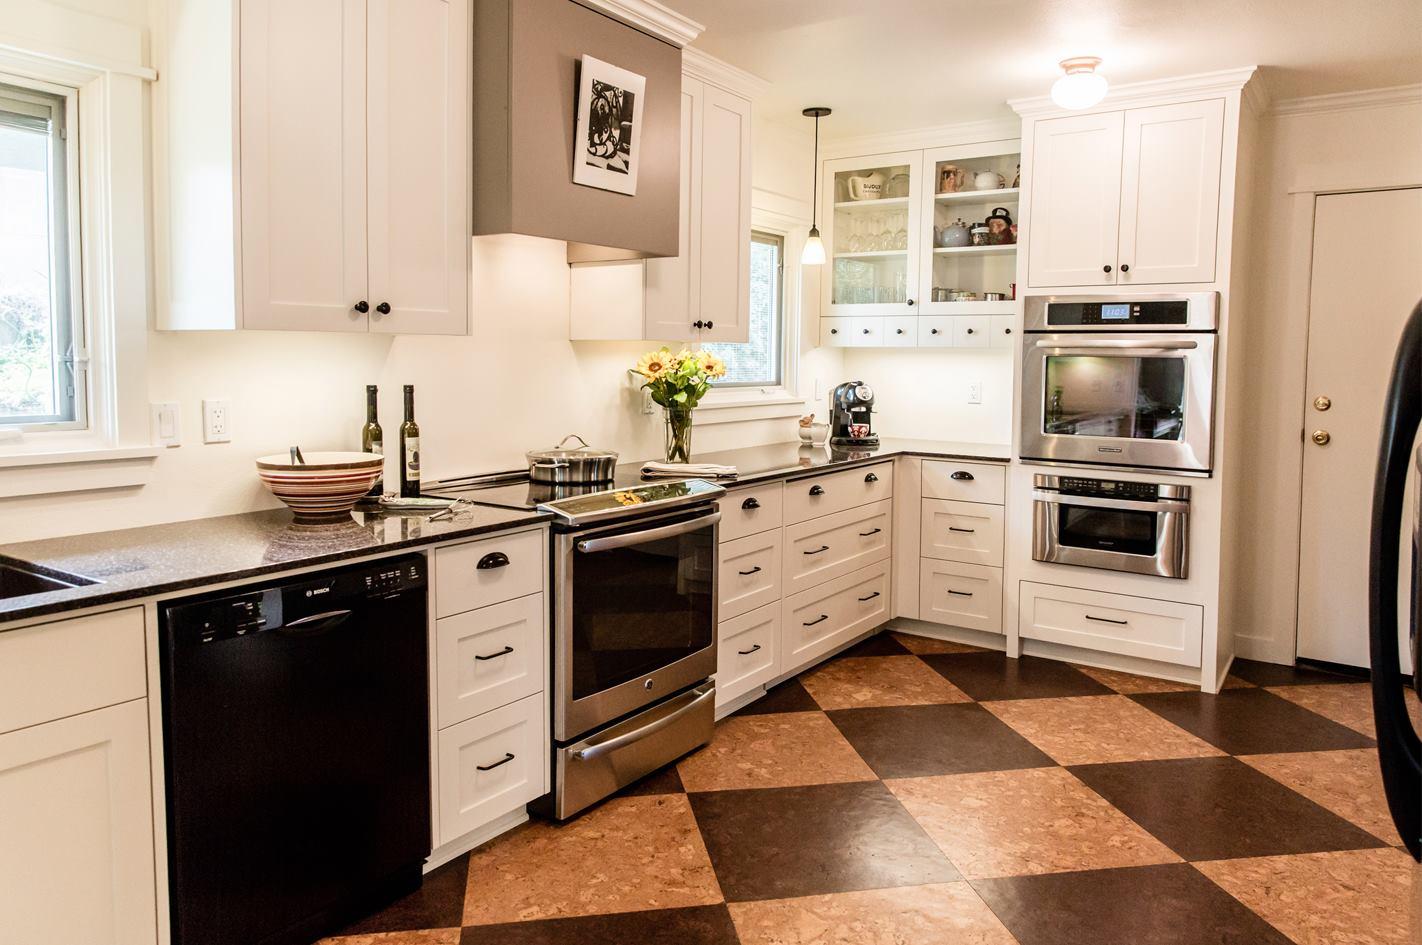 Durability – Cork Floors Are Tough!